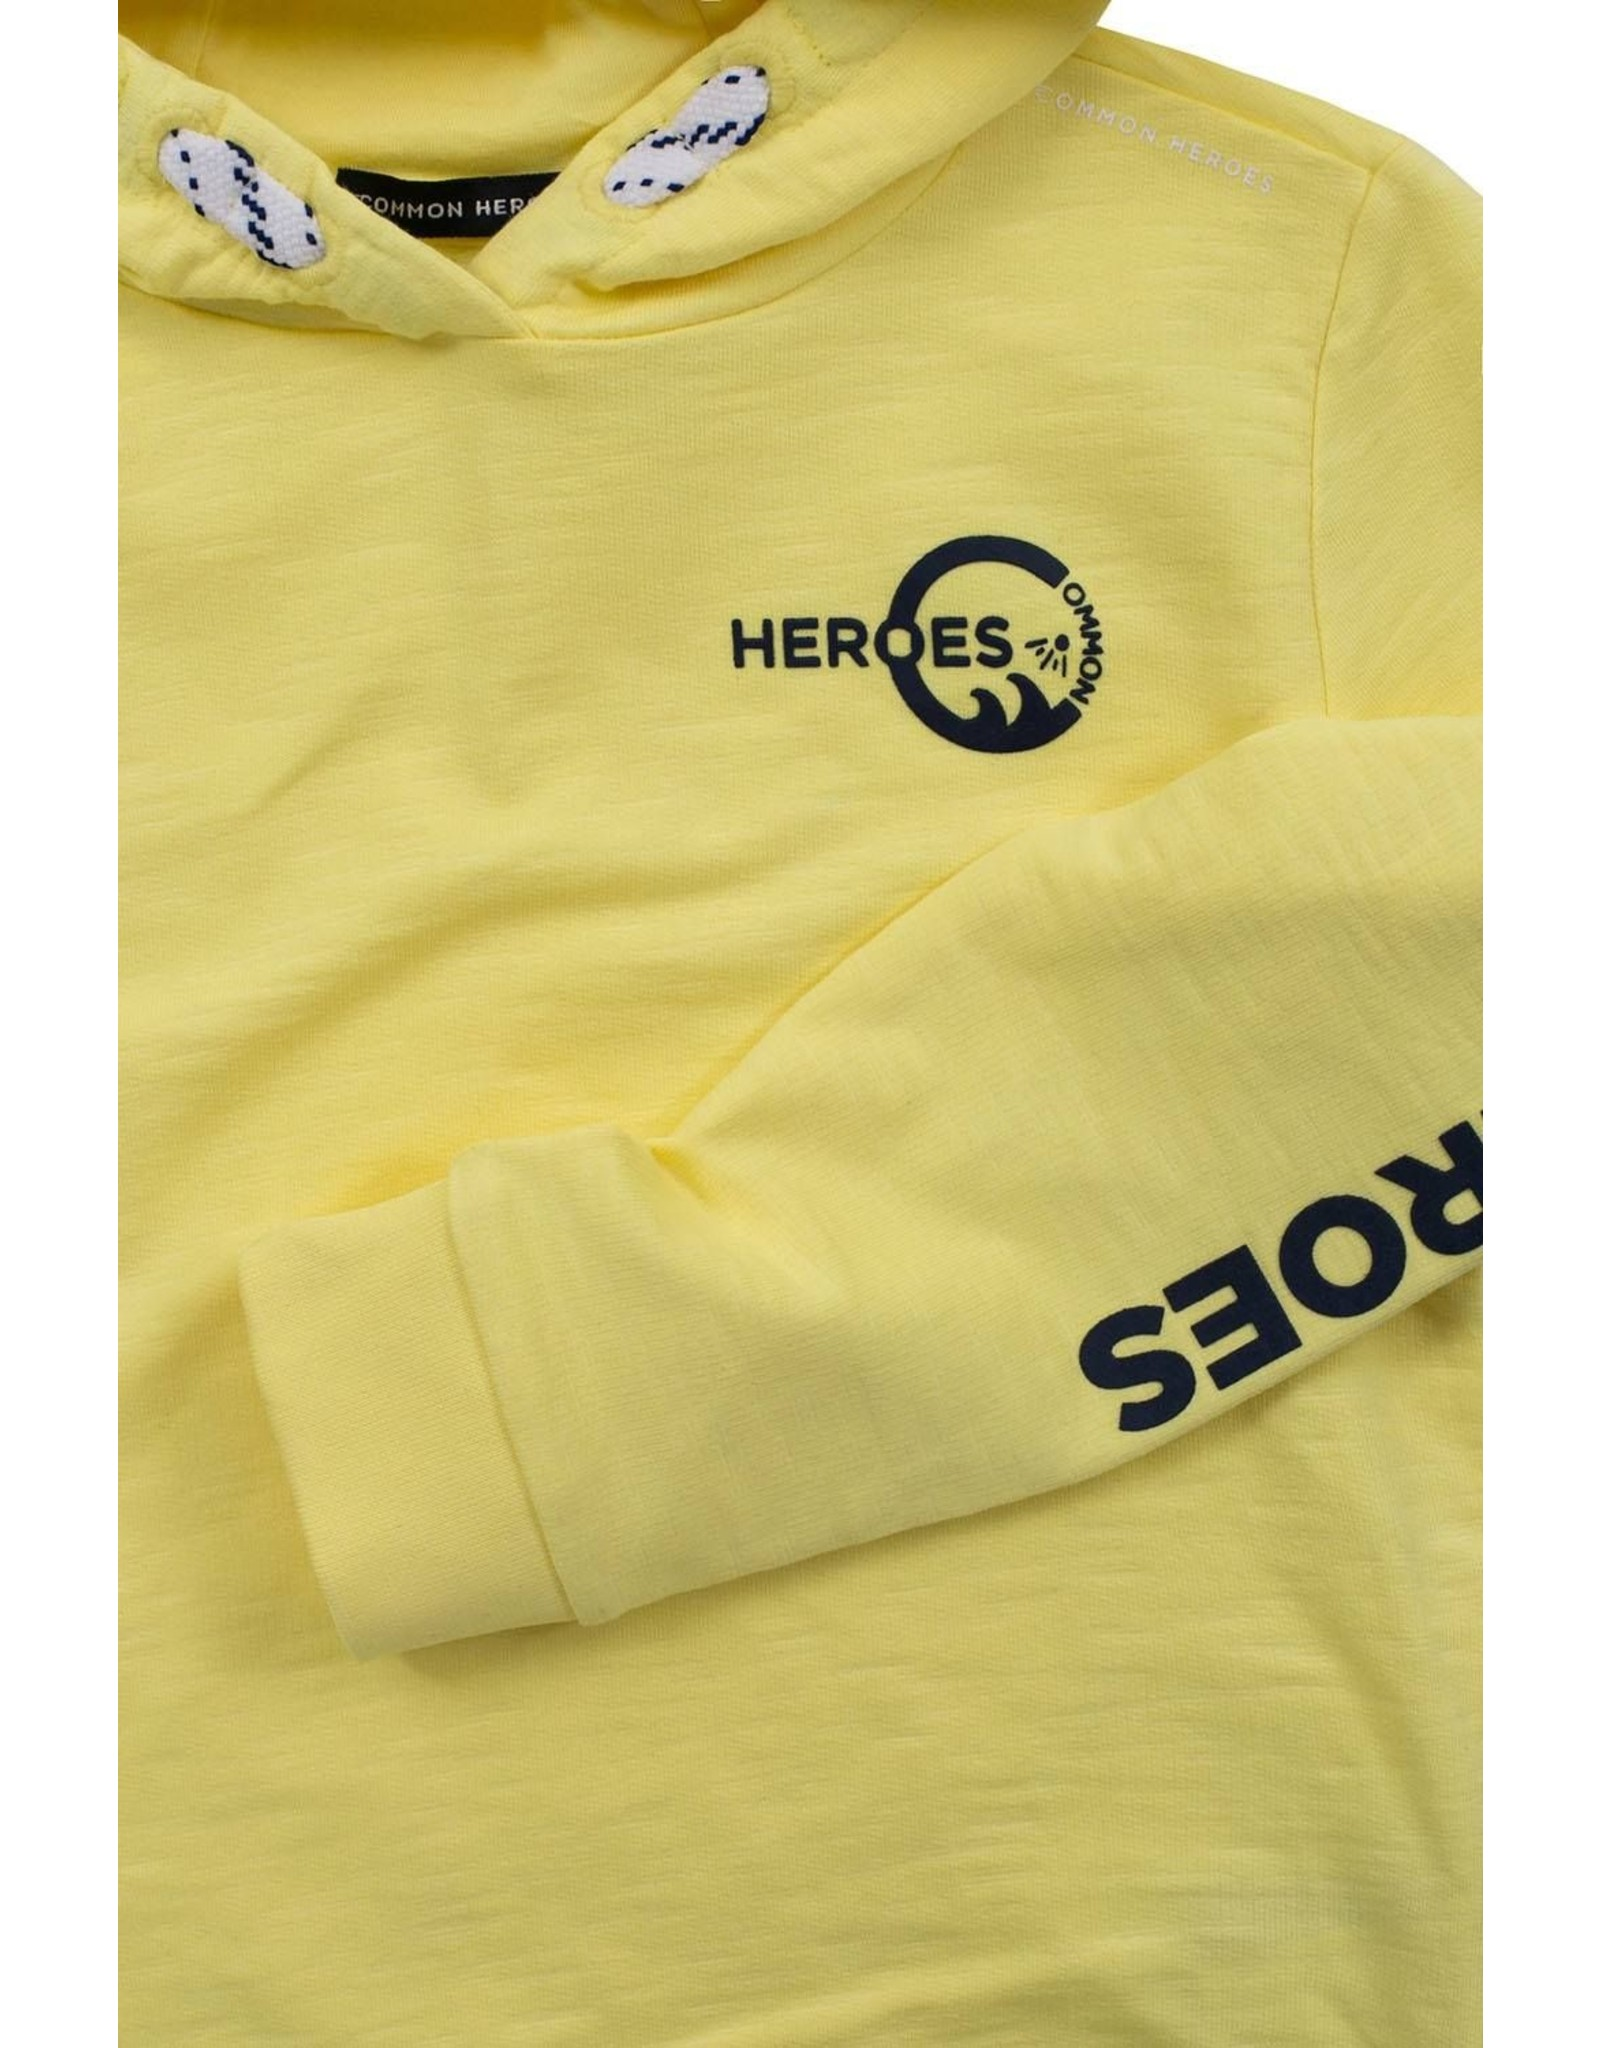 Common Heroes 2112-8363  Sweater